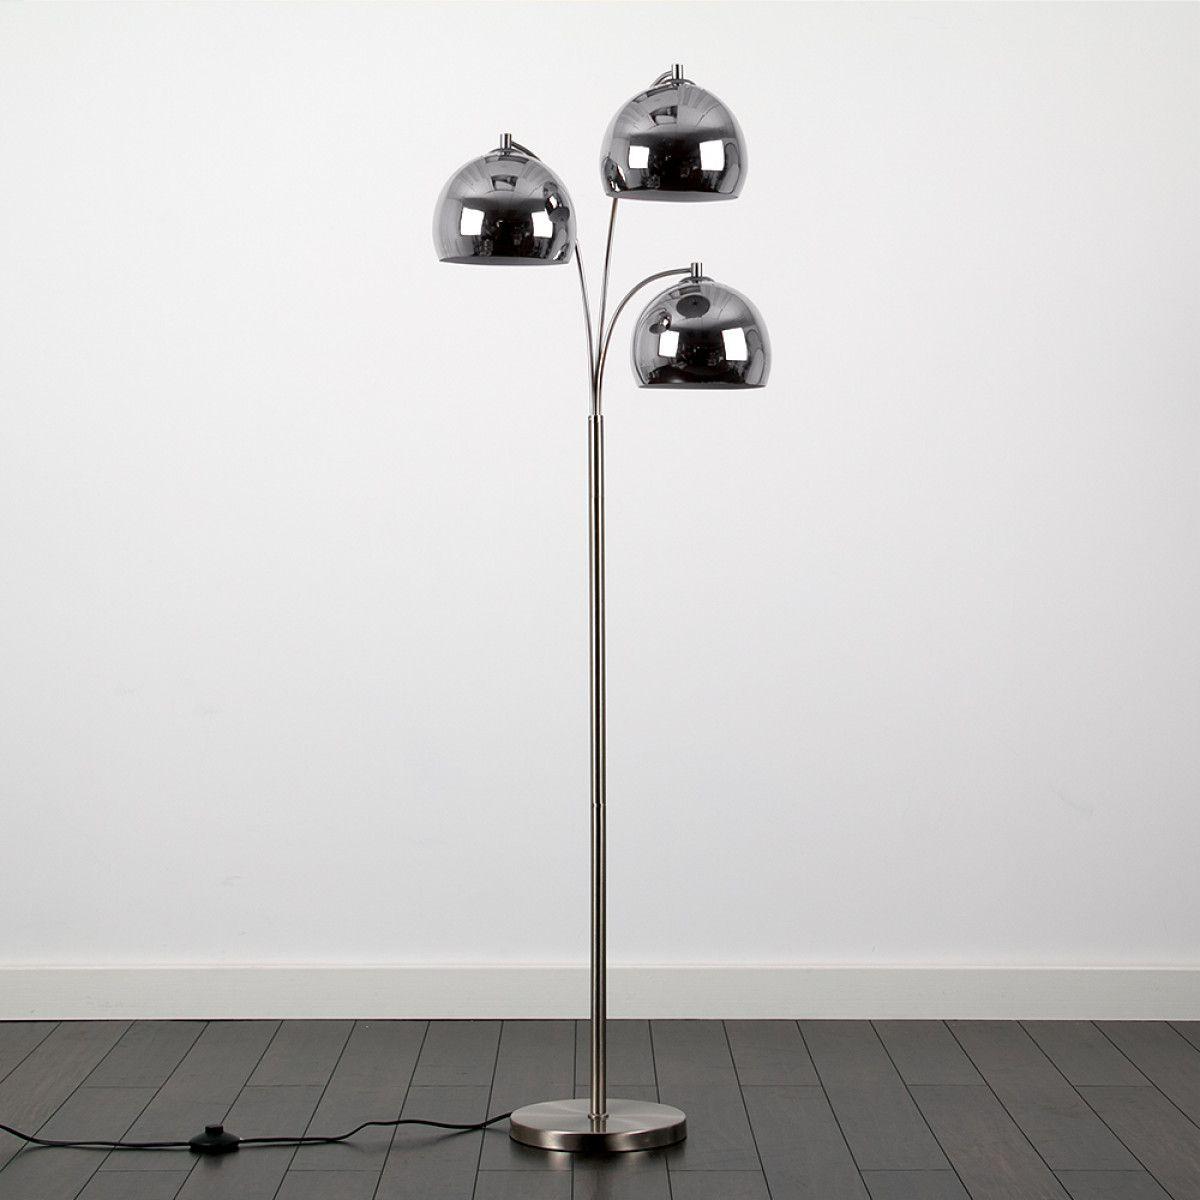 Dantzig Satin Nickel 3 Arm Floor Lamp with Chrome Dome